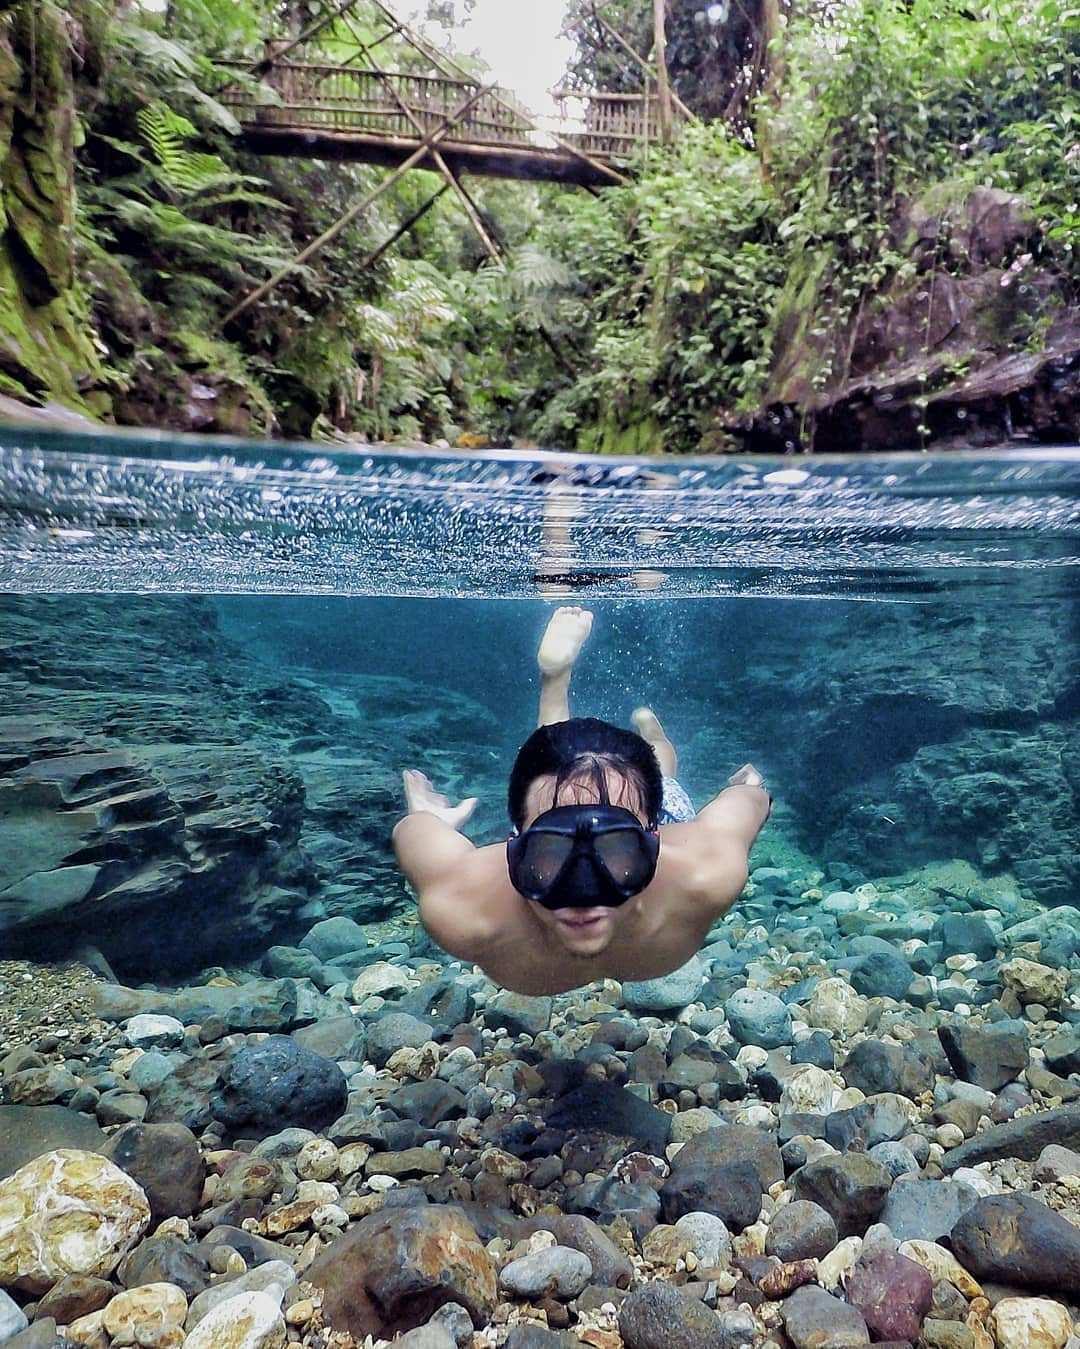 Berenang di Curug Balong Endah Bogor Image From @wandy_day94